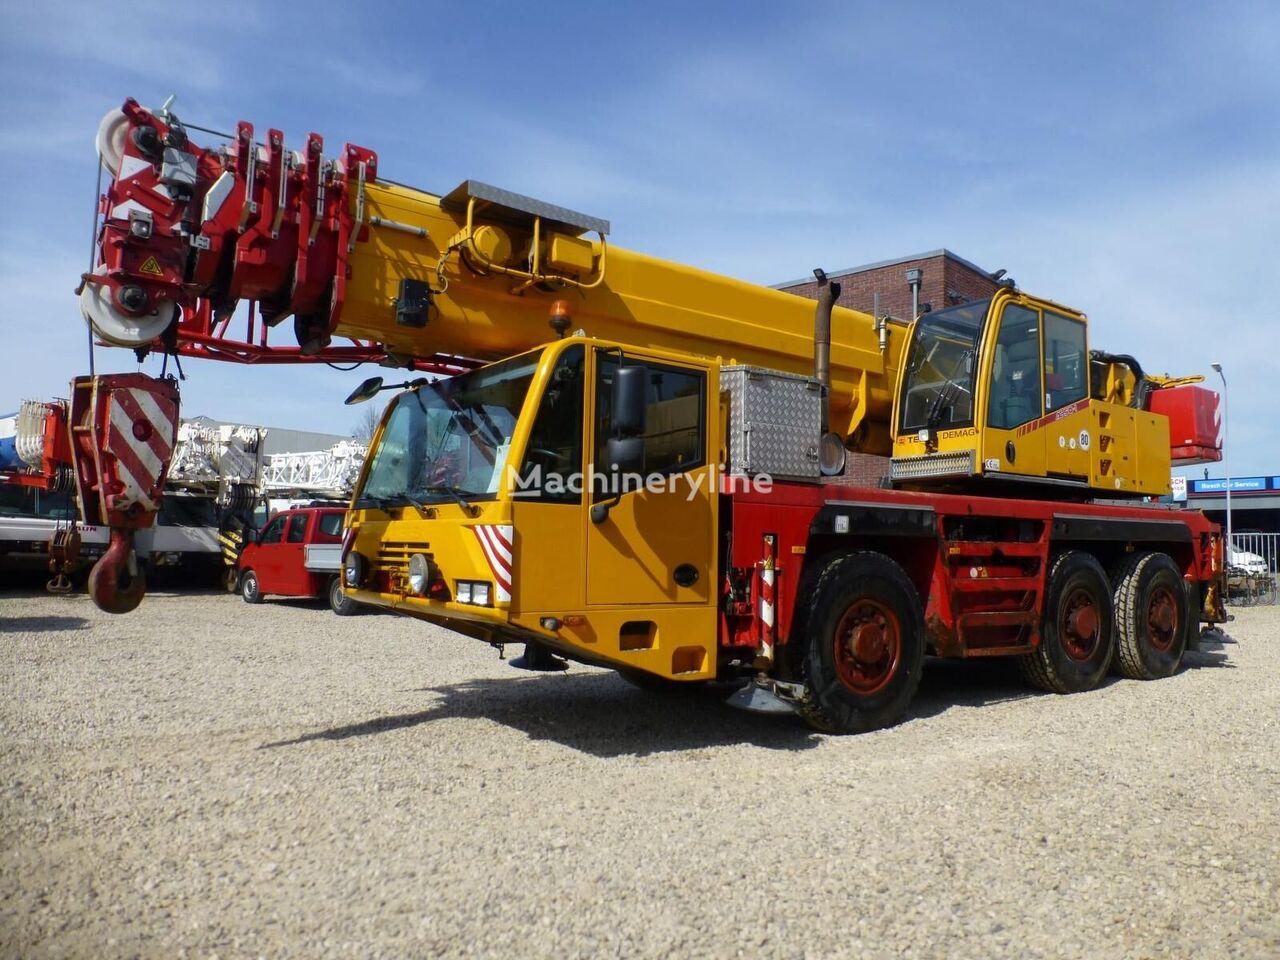 TEREX Terex-Demag AC 50-1 mobile crane